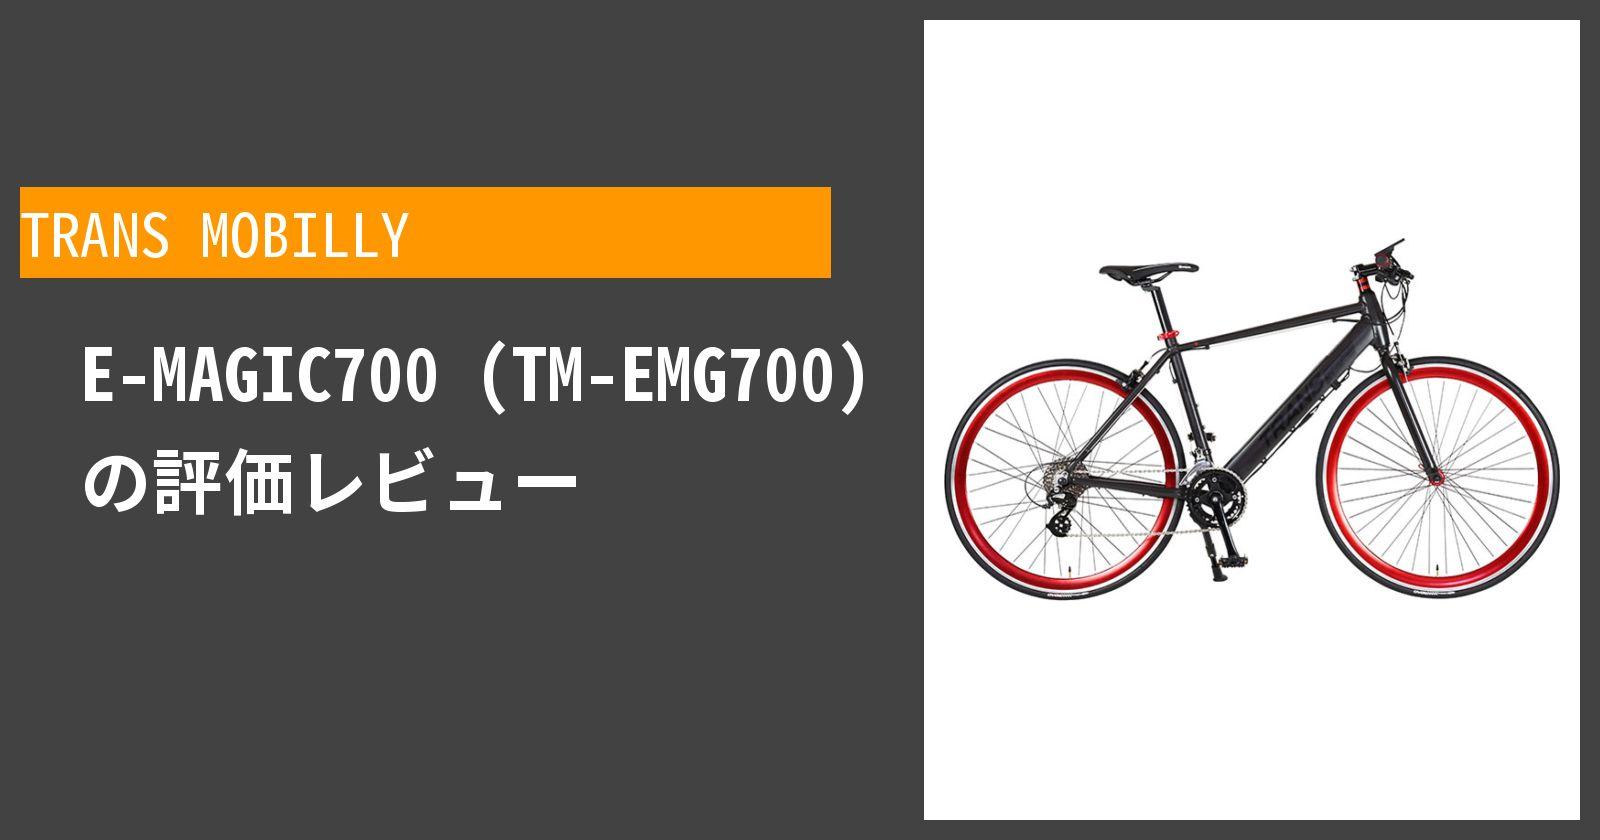 E-MAGIC700 (TM-EMG700)を徹底評価